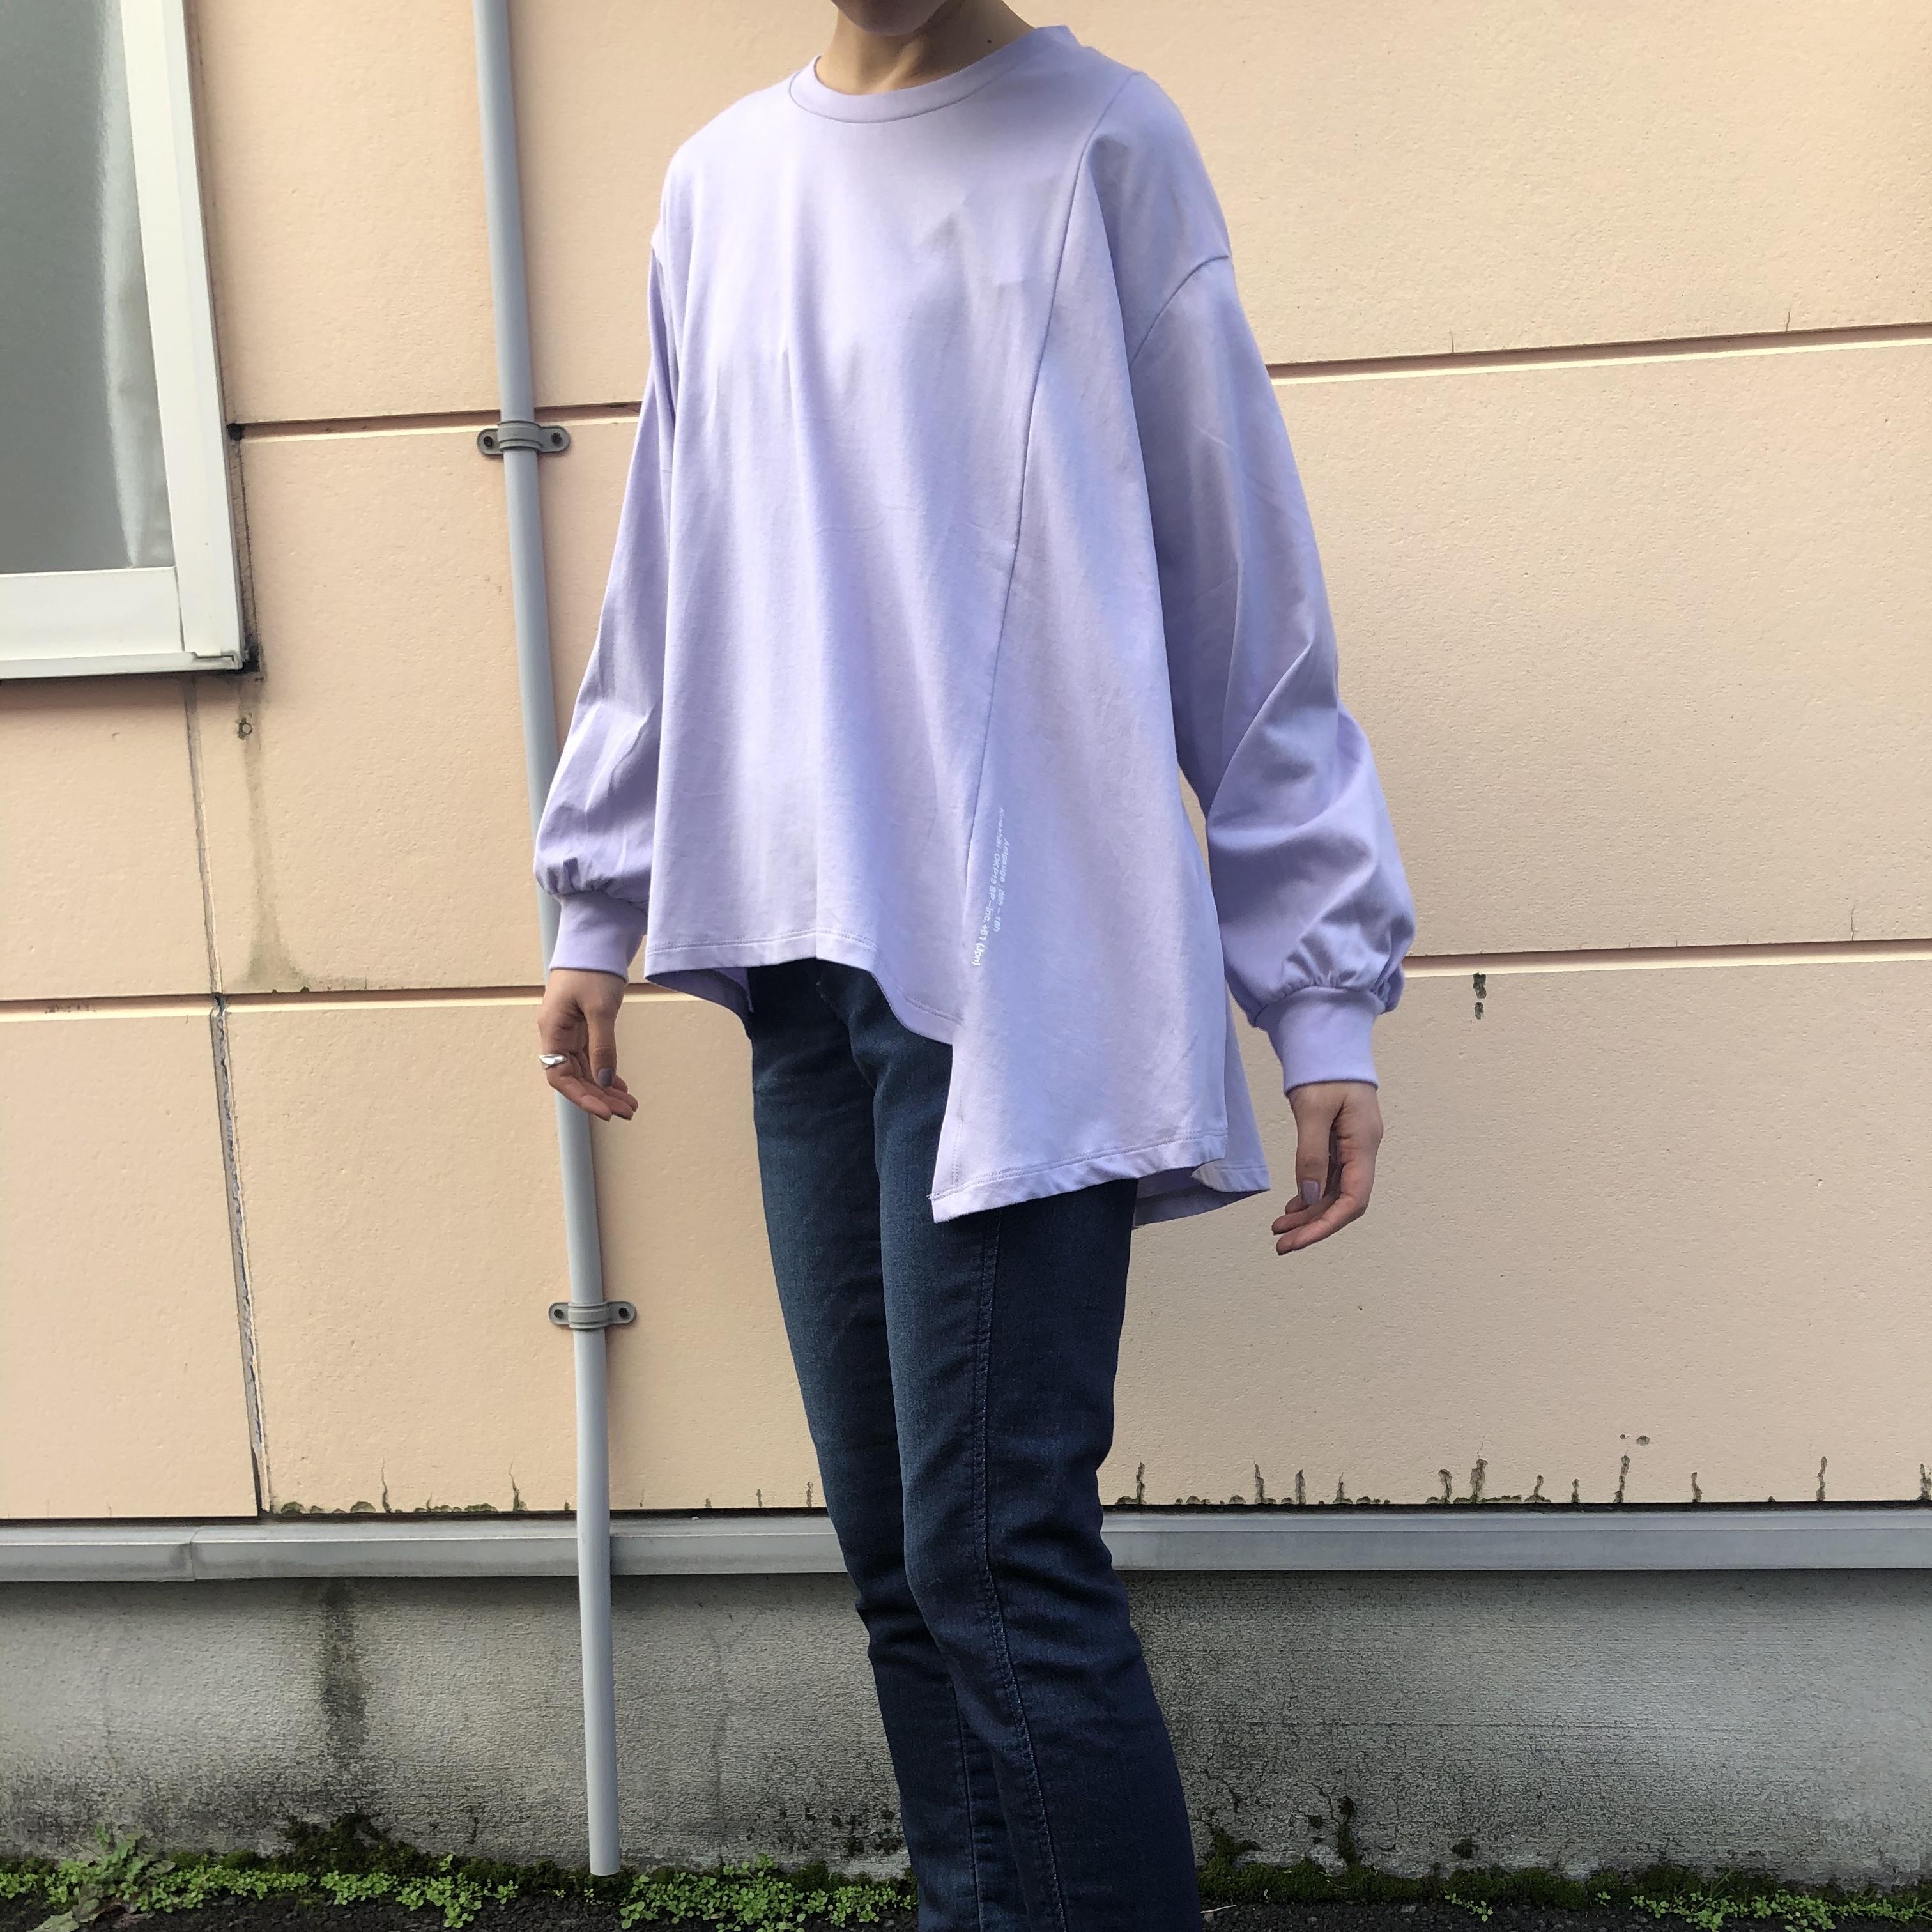 【 ANTGAUGE 】- AB873 - アシンメトリーTシャツ